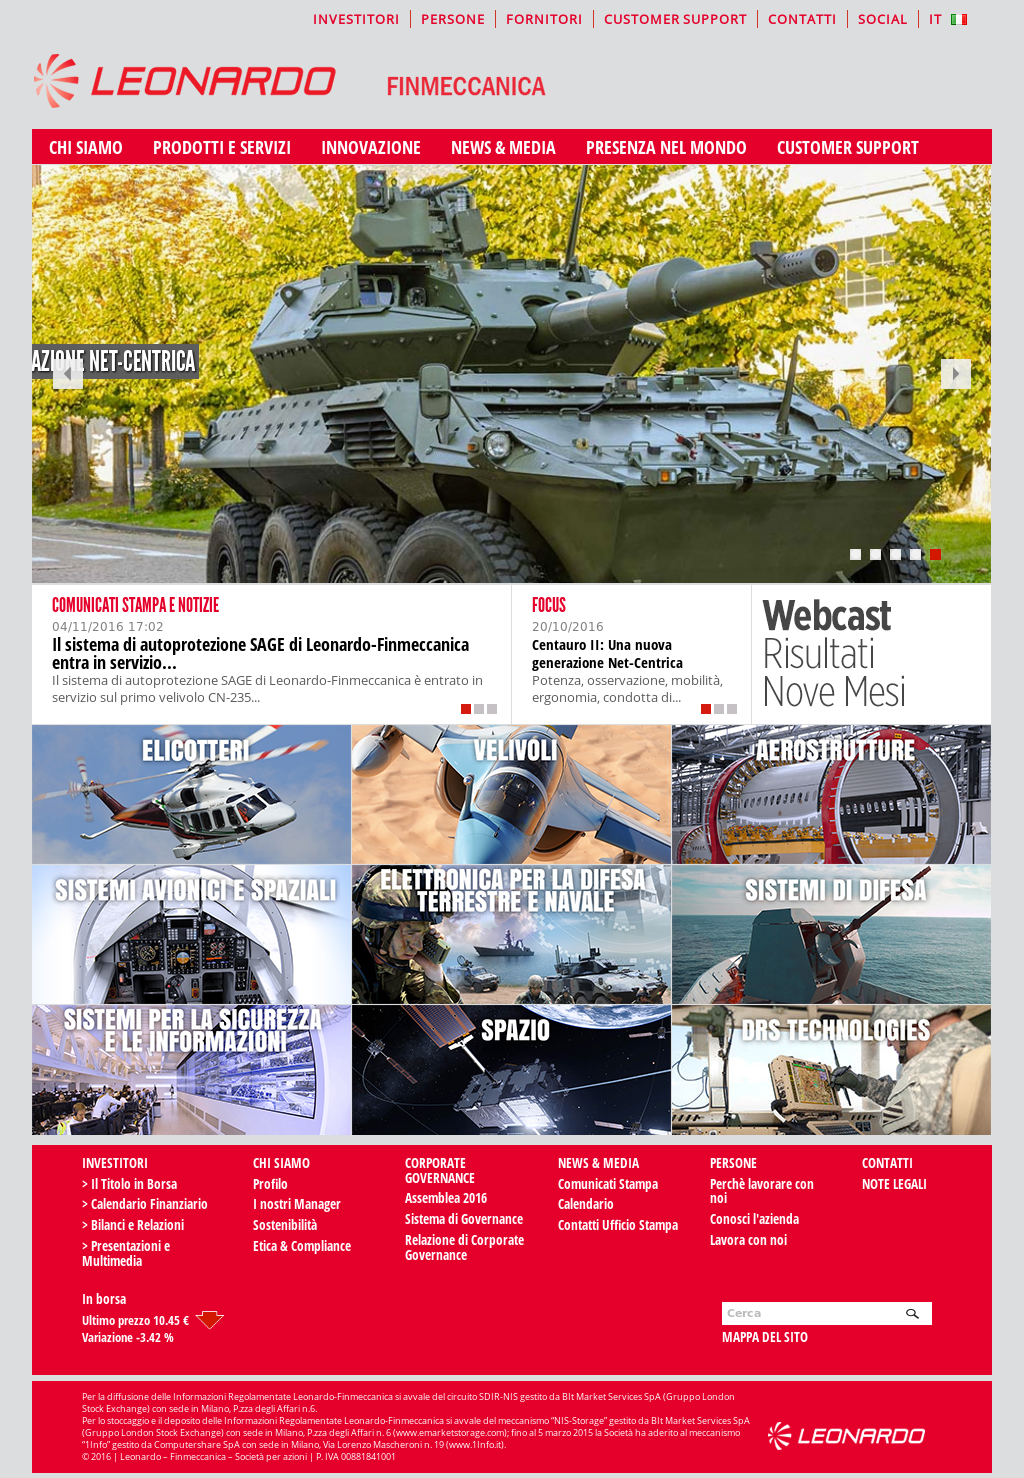 Owler Reports - Leonardo Company: Leonardo-Finmeccanica to